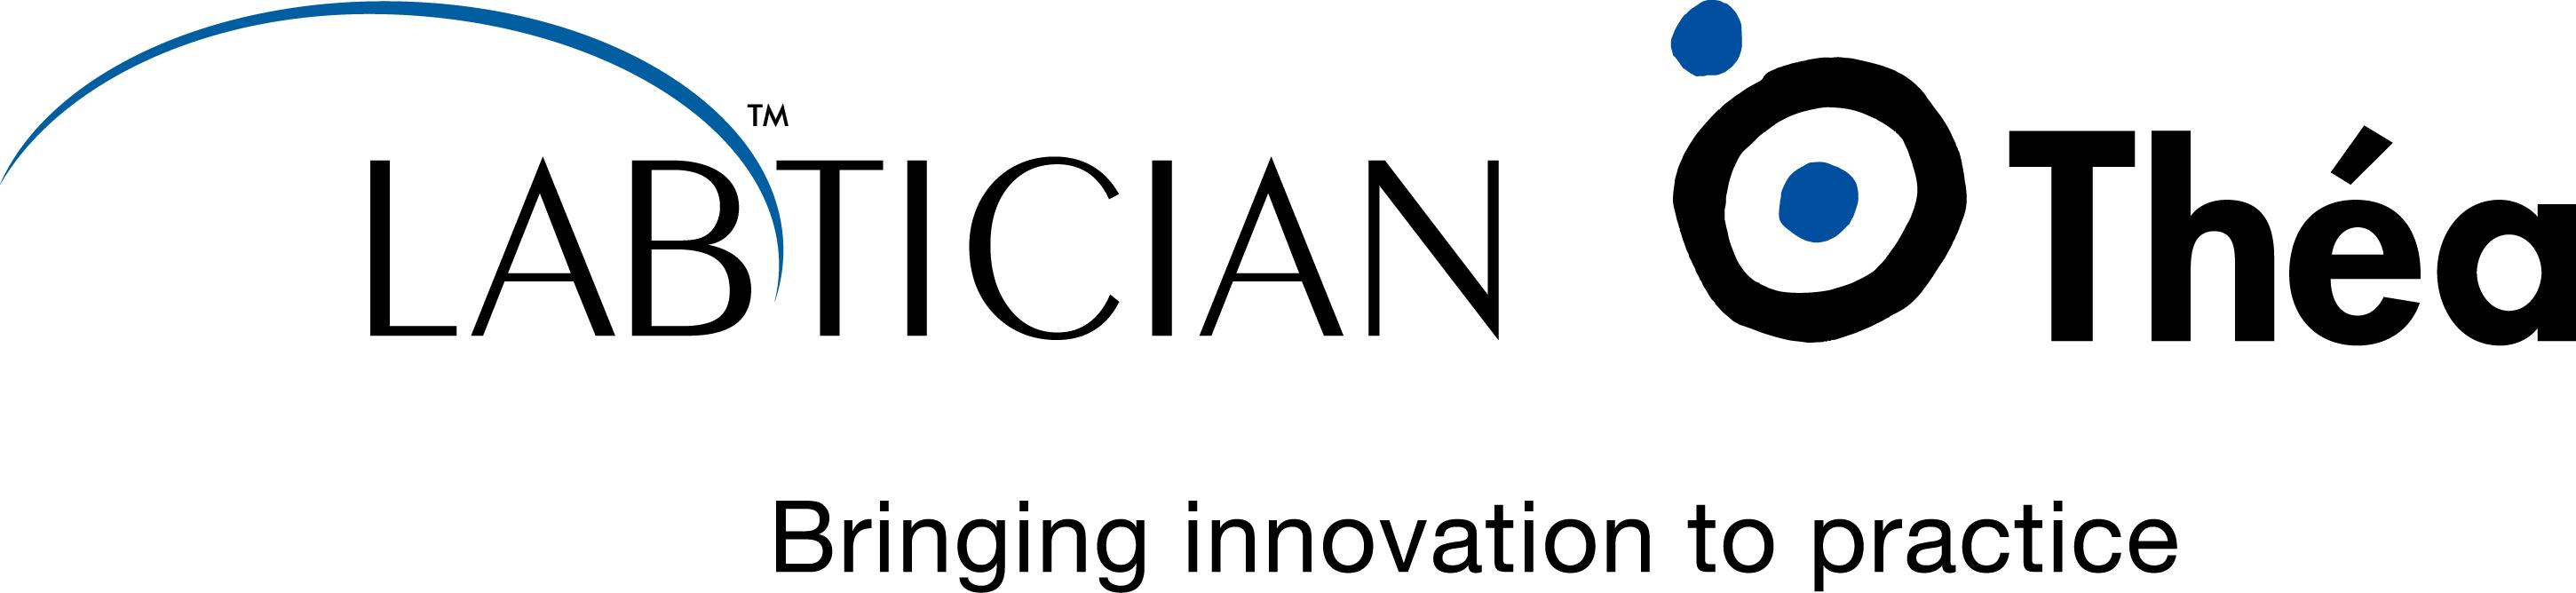 Labtician Thea logo